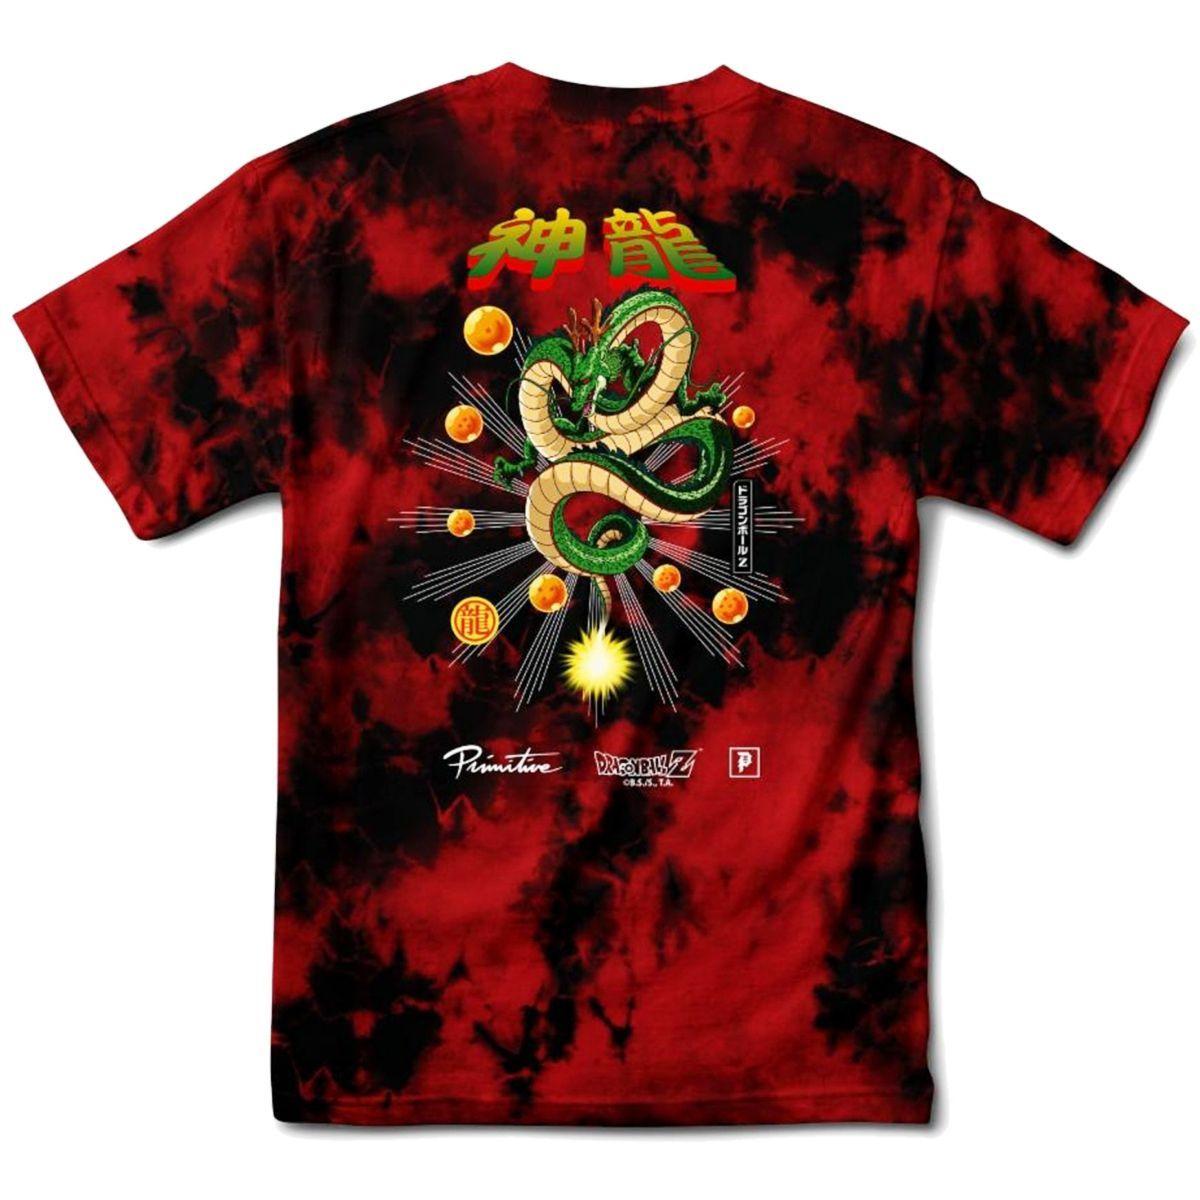 Primitive Skate x Dragon Ball Z Mens Beanie II Black